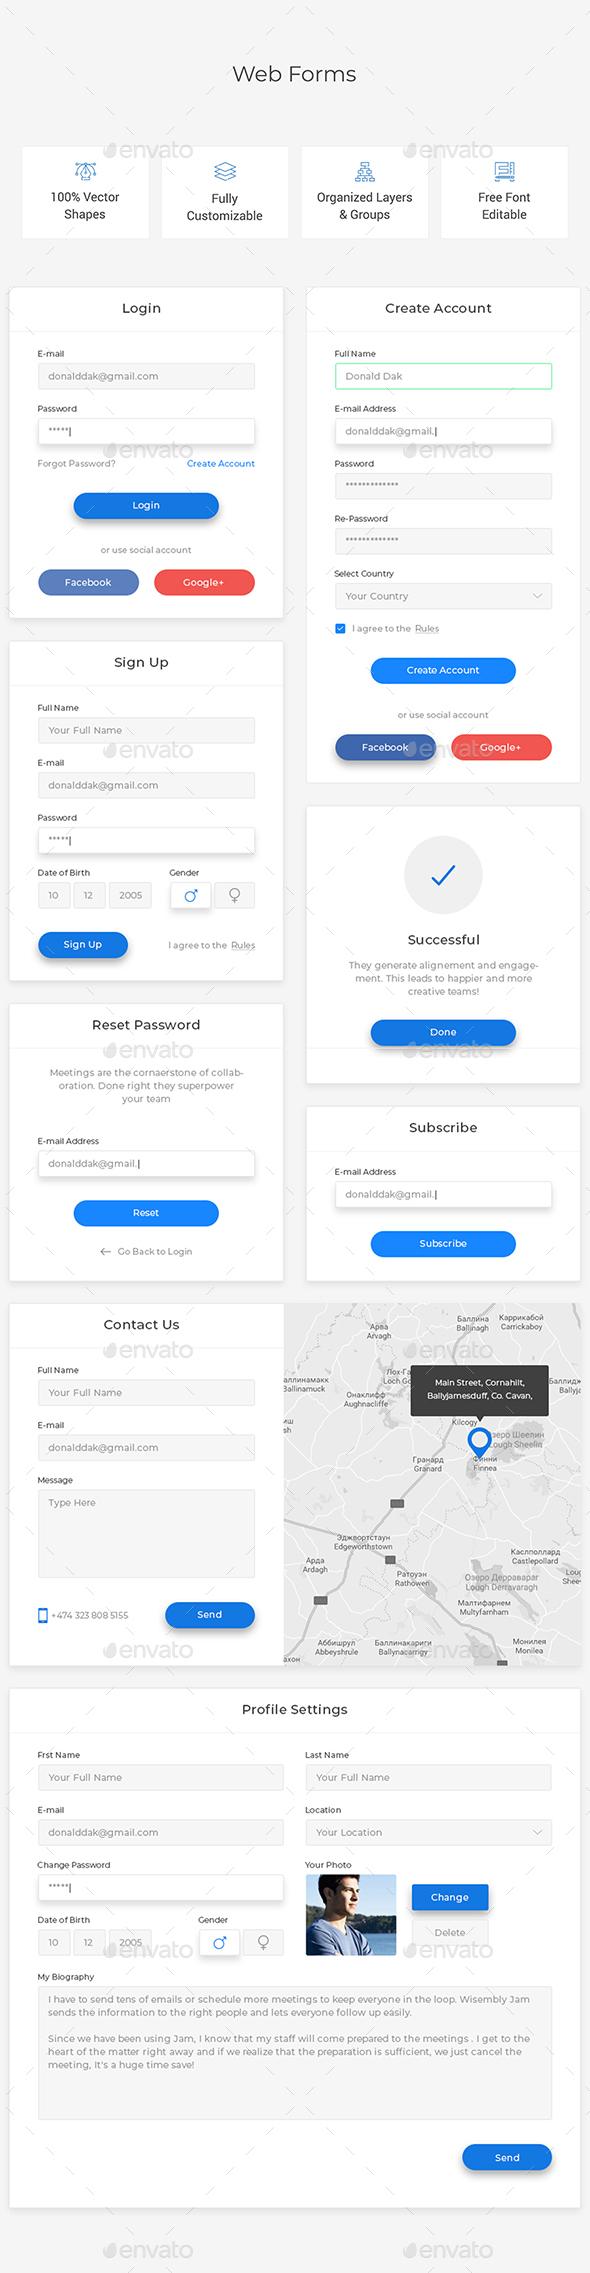 Web Forms - Forms Web Elements